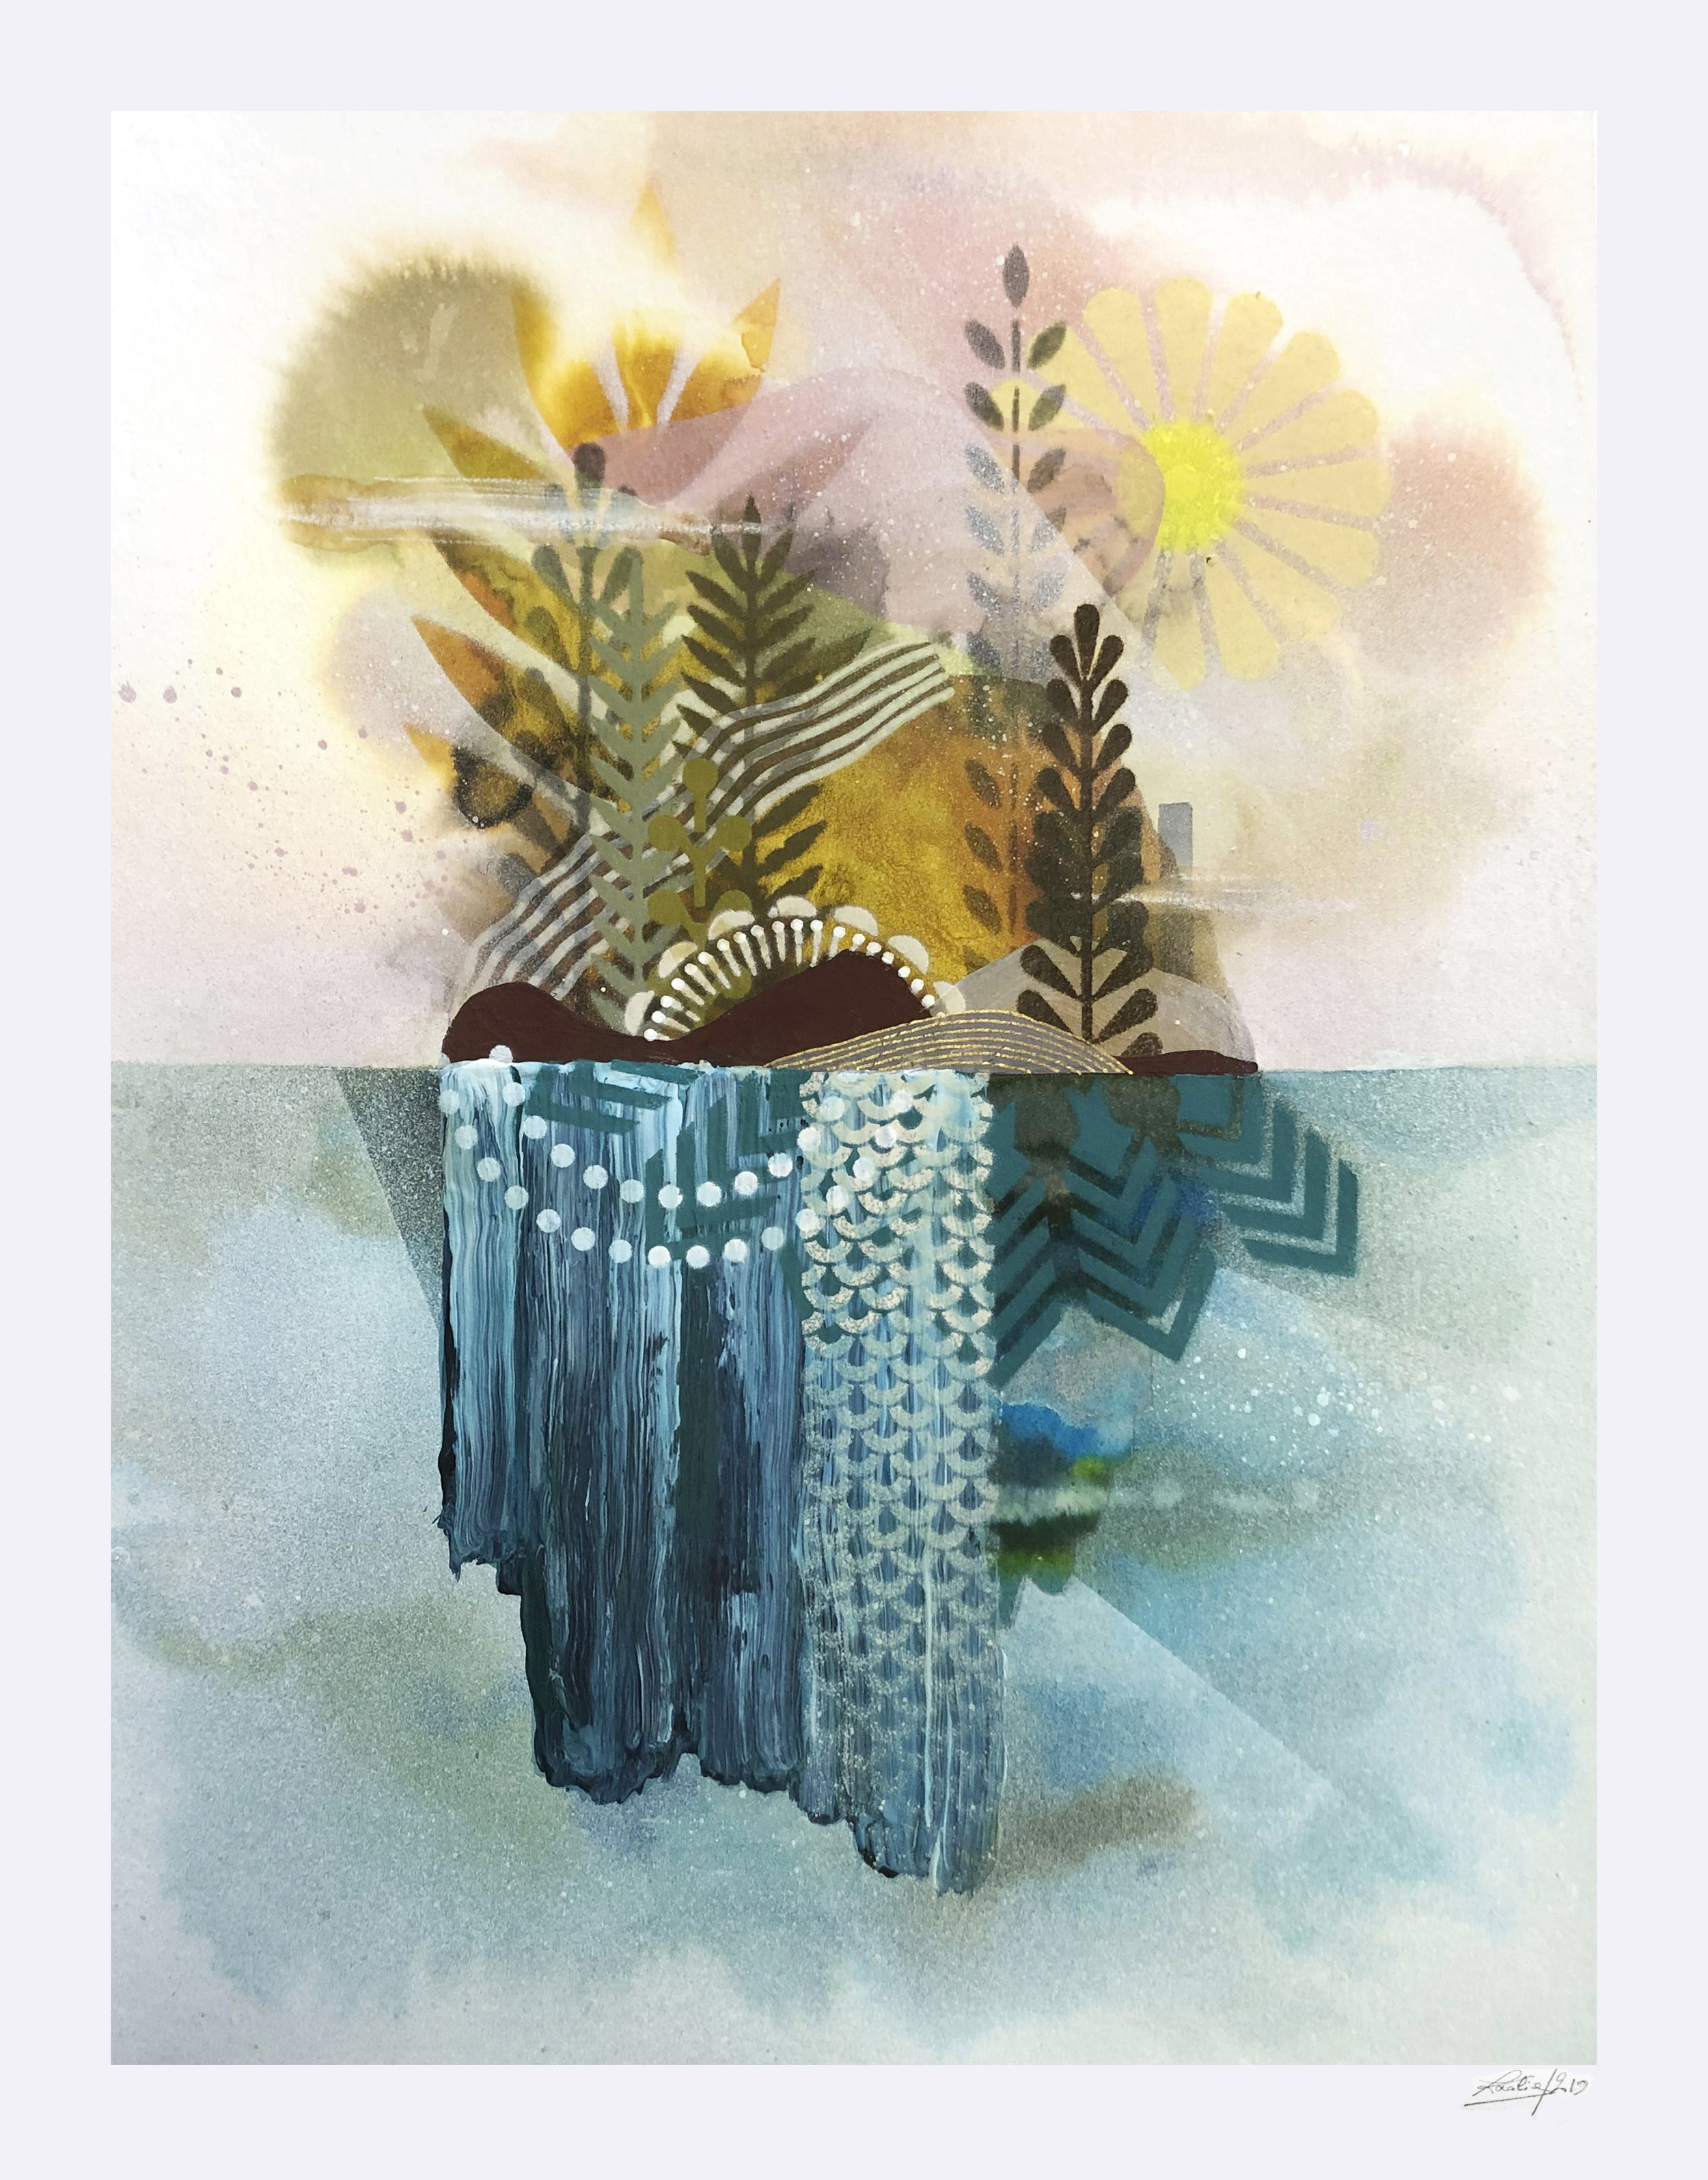 Jardin Flottant #2  - Mix media on paper - 36 x46 cm | 2019